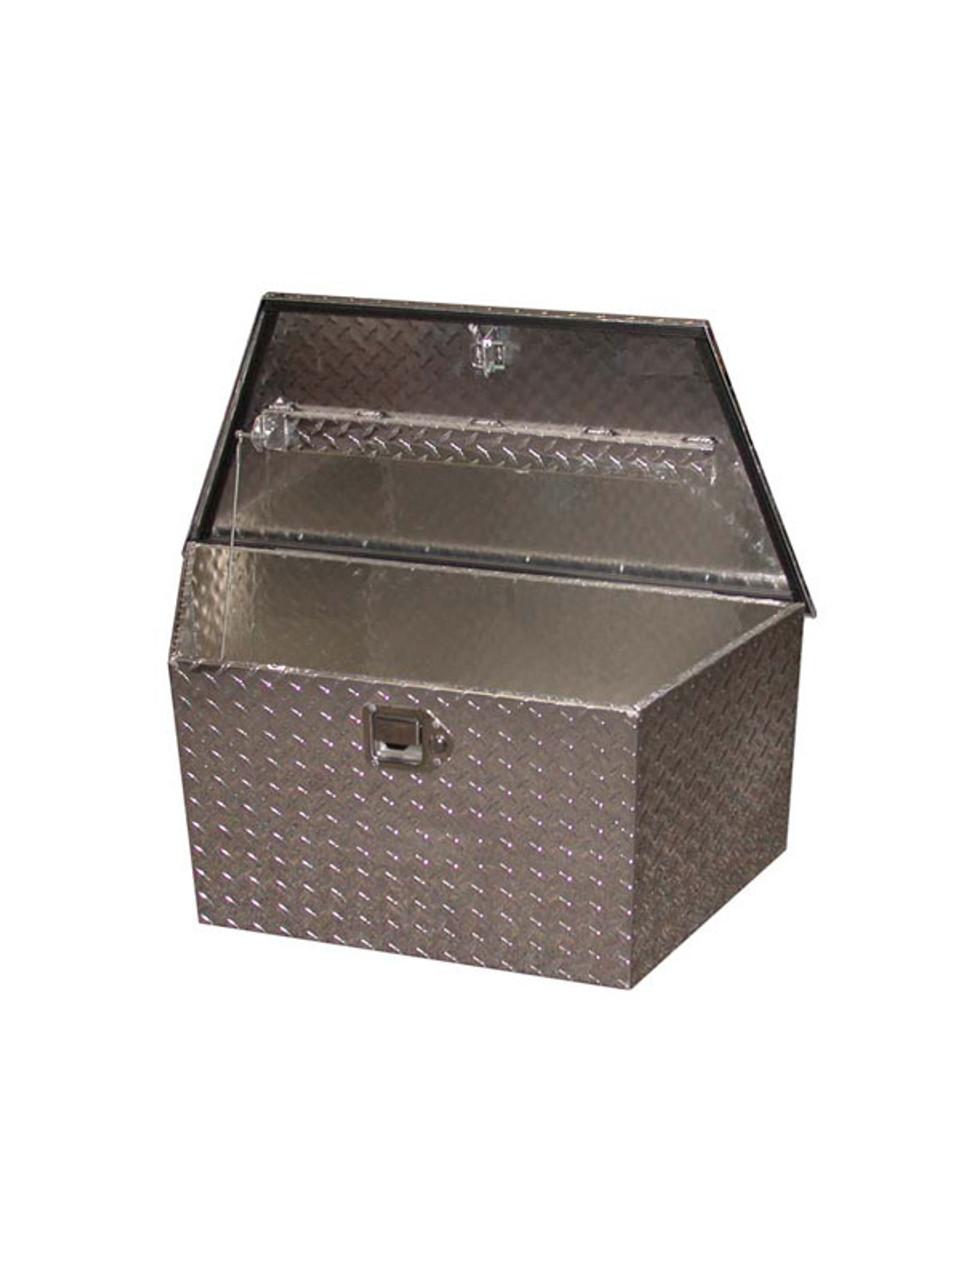 ATBA49 --- A-Frame Tool Box -  Aluminum